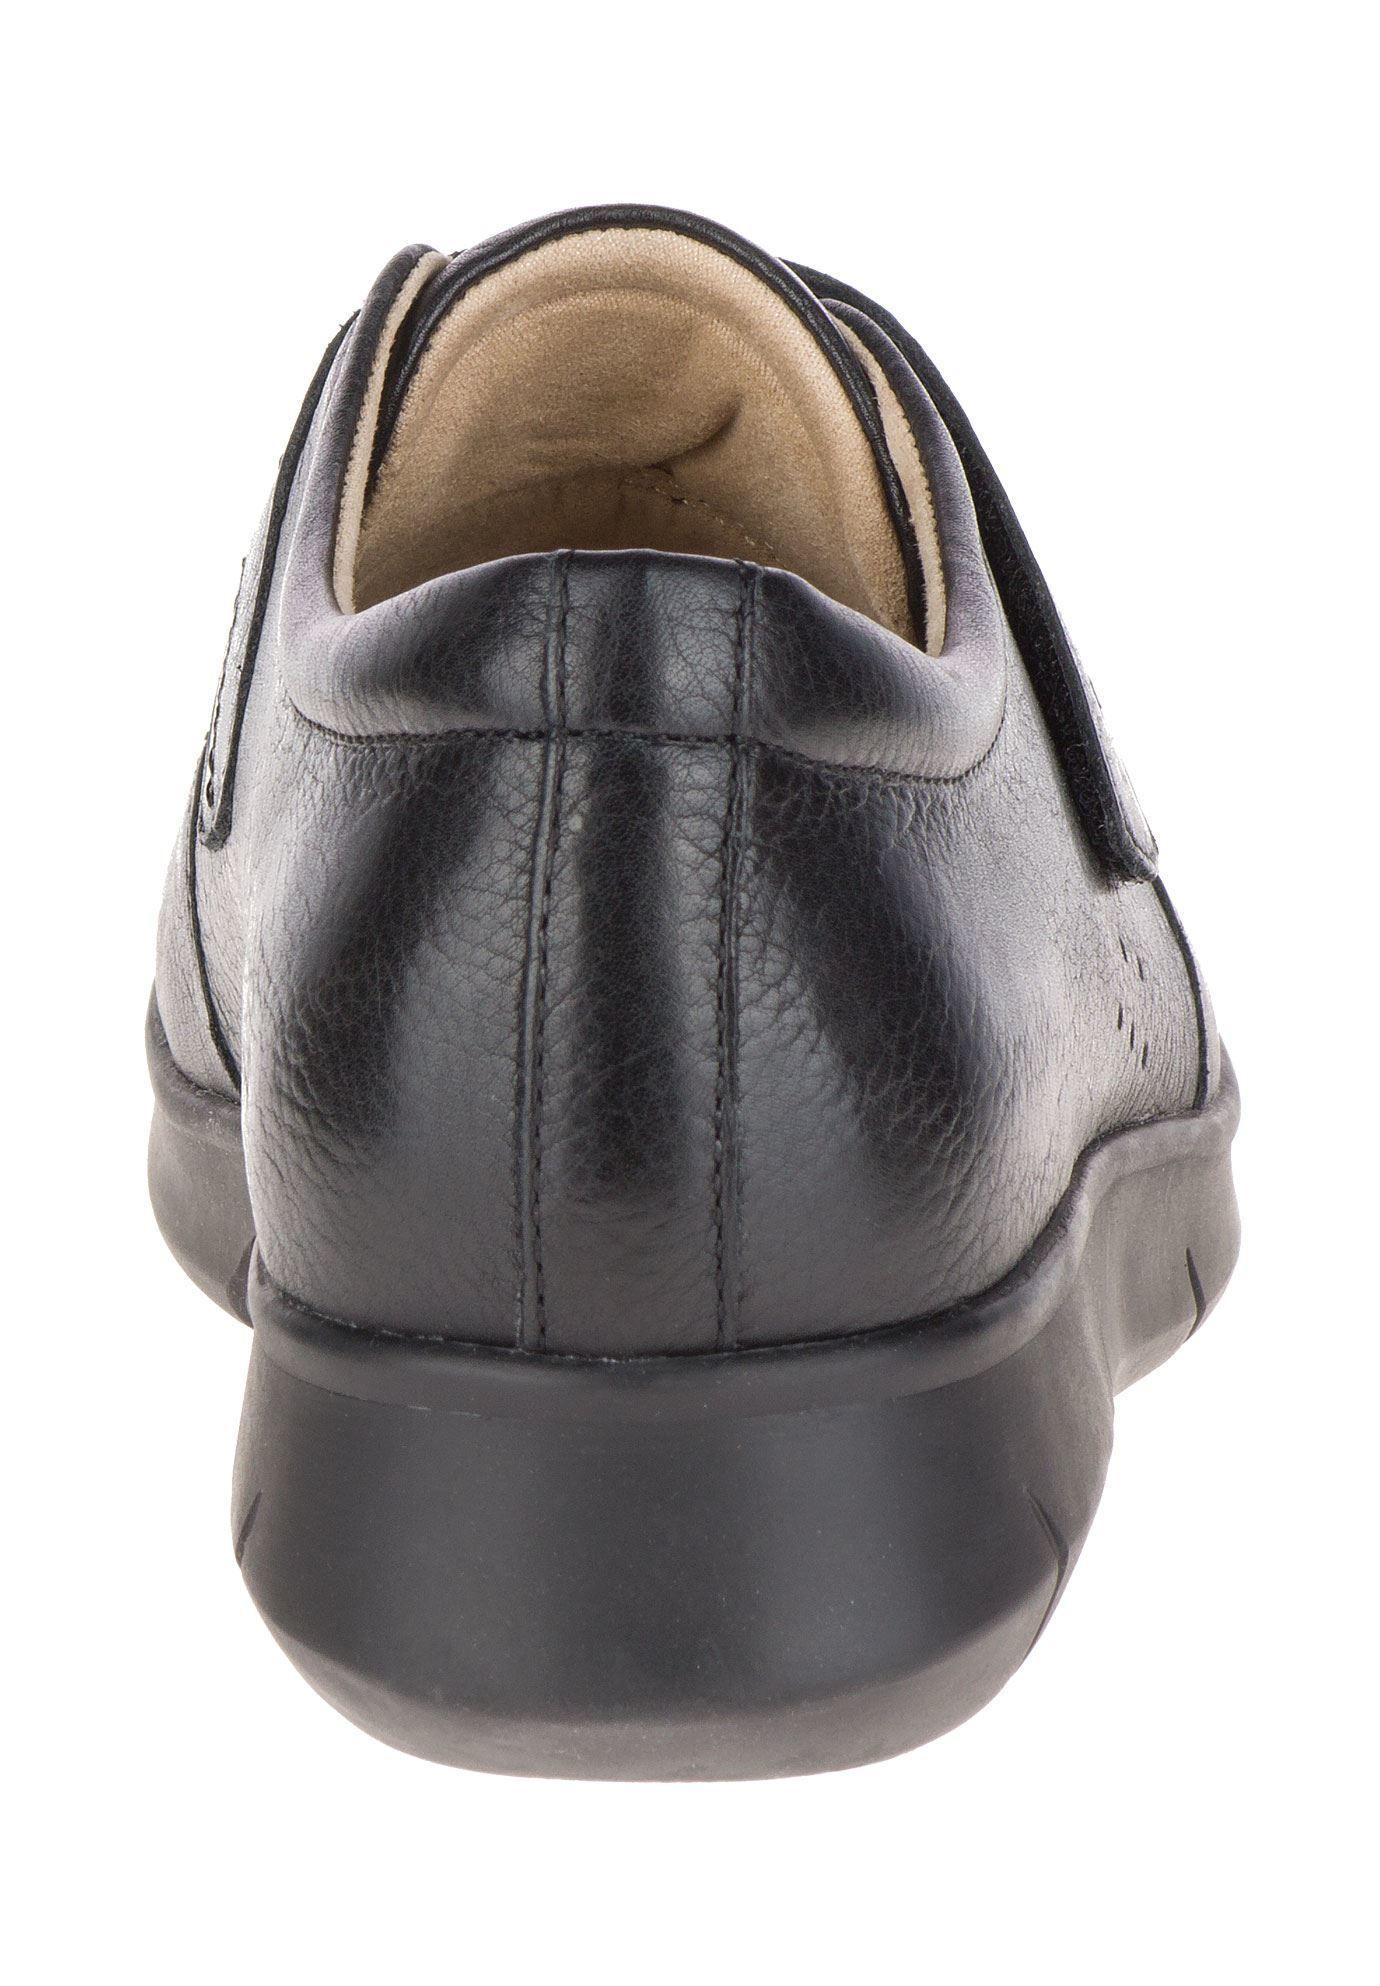 crois mardie mardie crois chaussures hush puppies des vêteHommes ts xxl 699f39